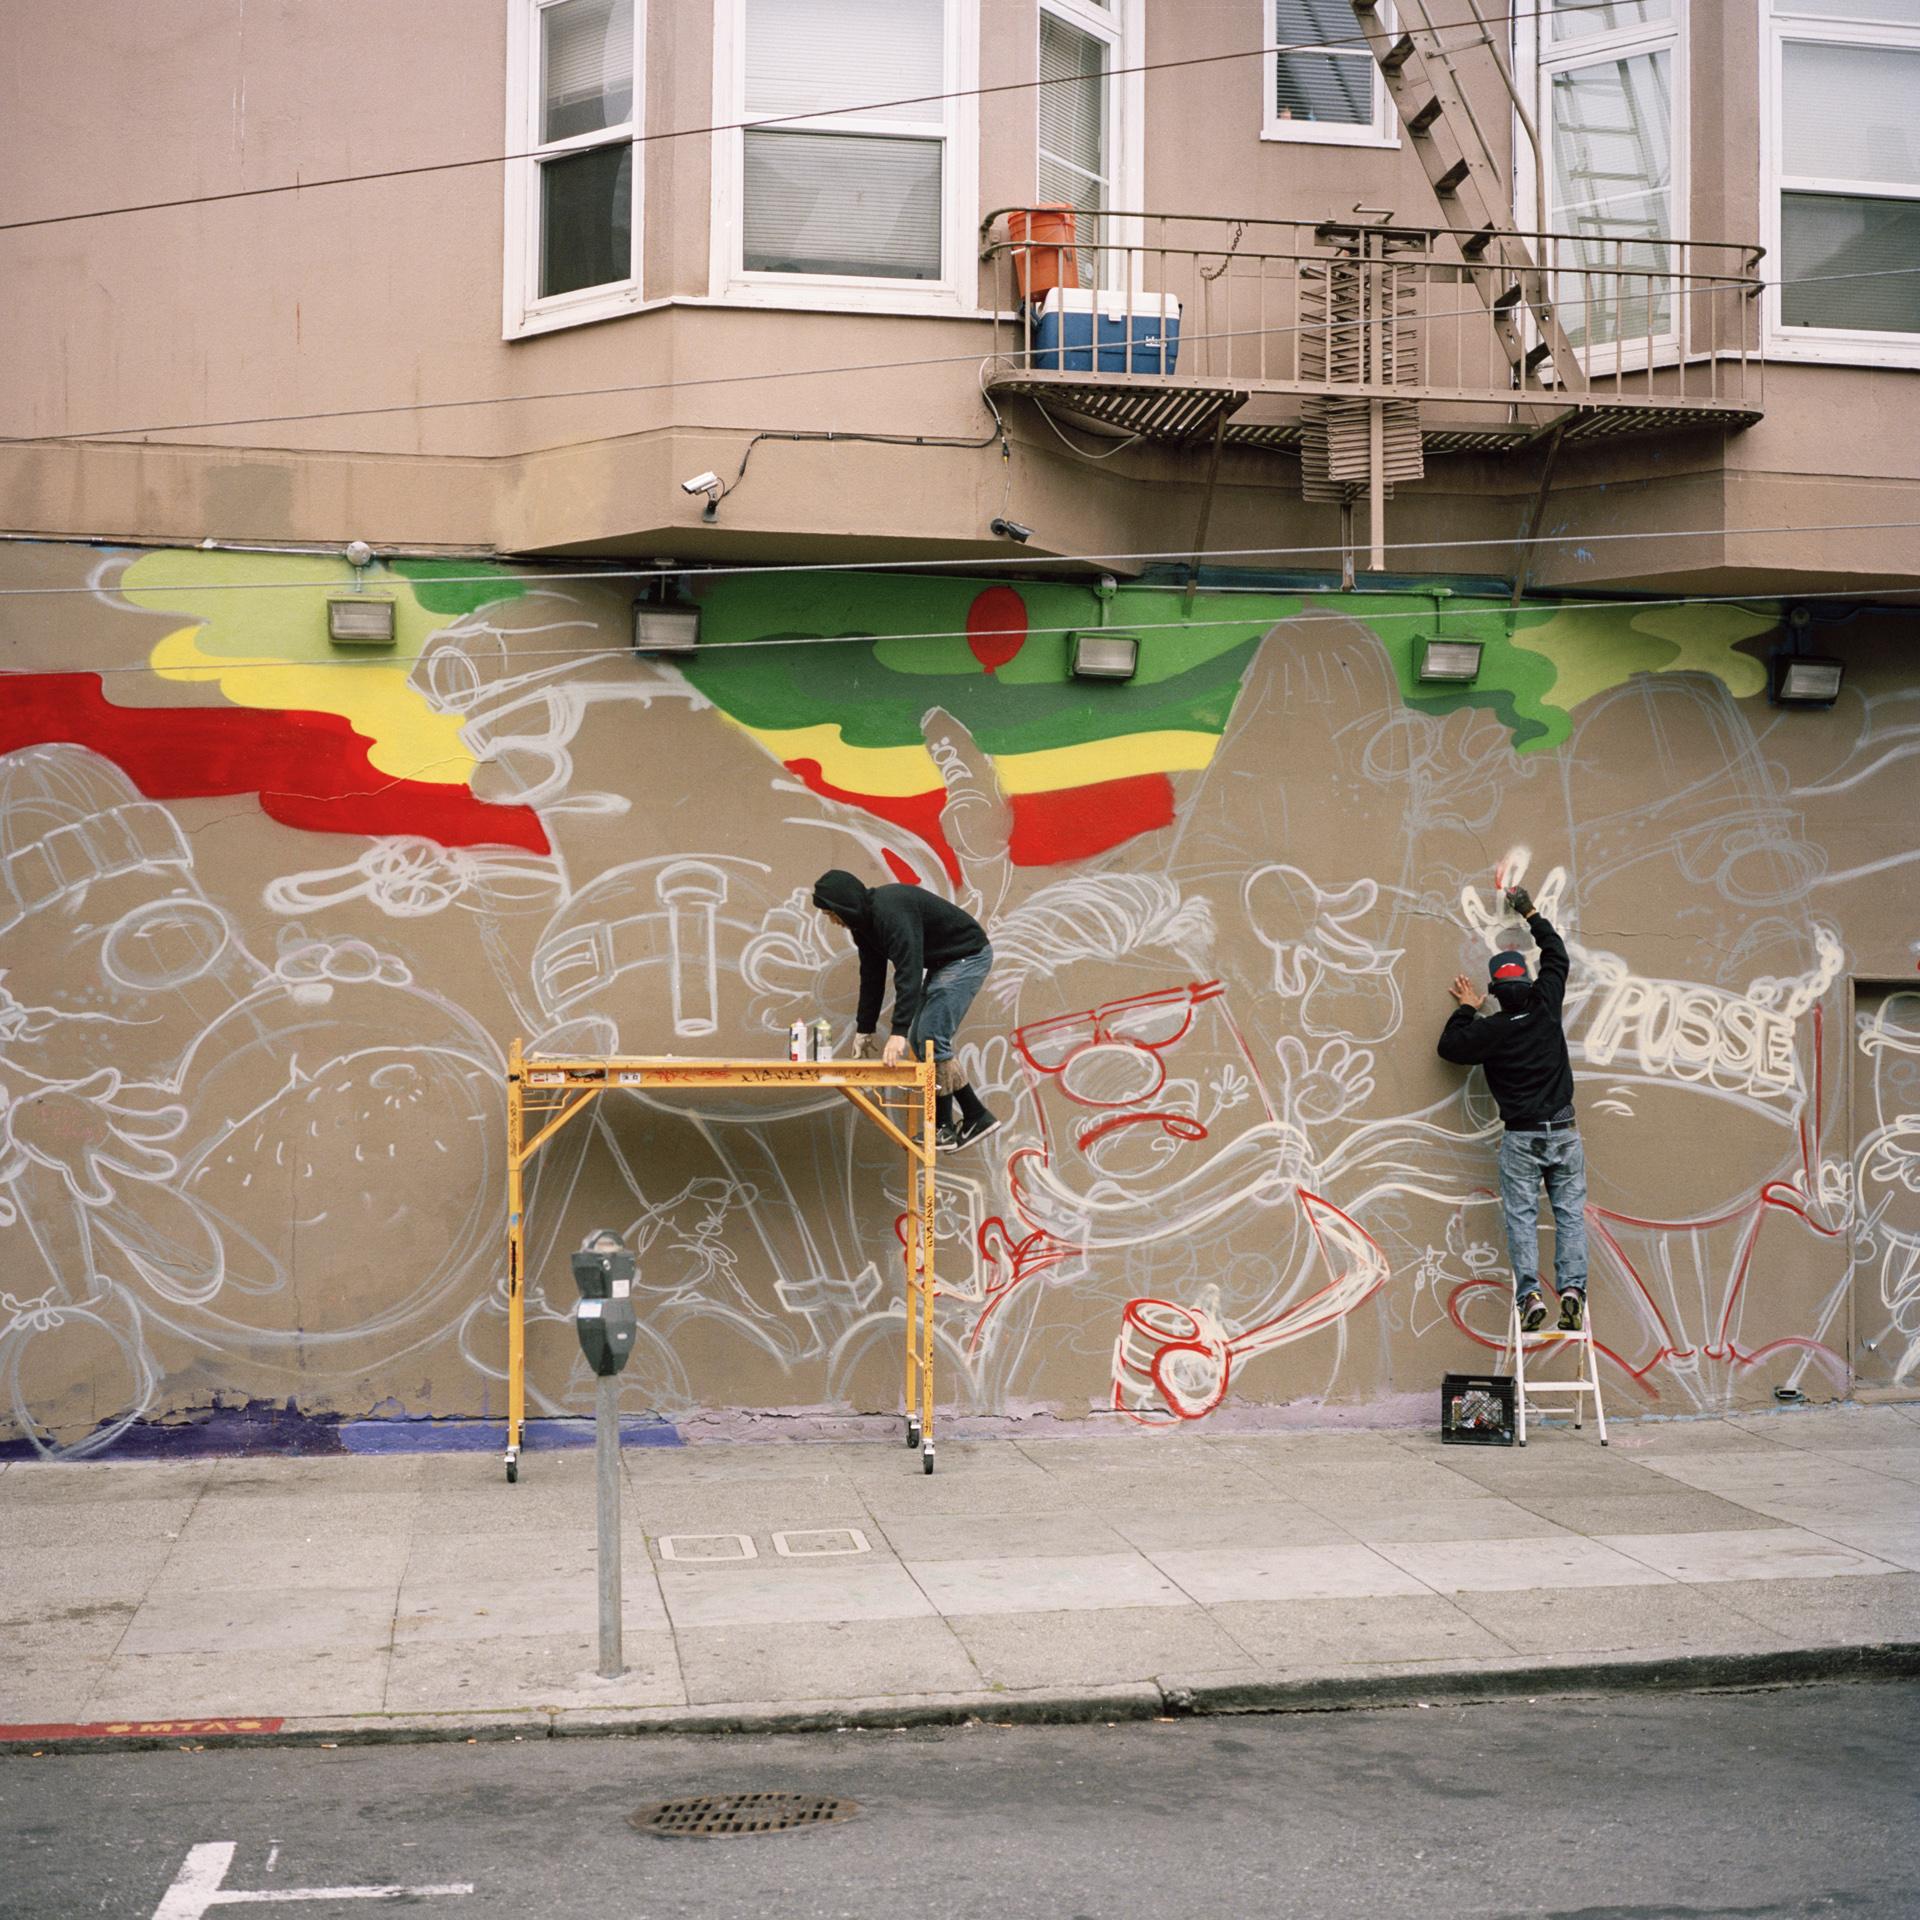 San Francisco. Graffiti near Haight Street.